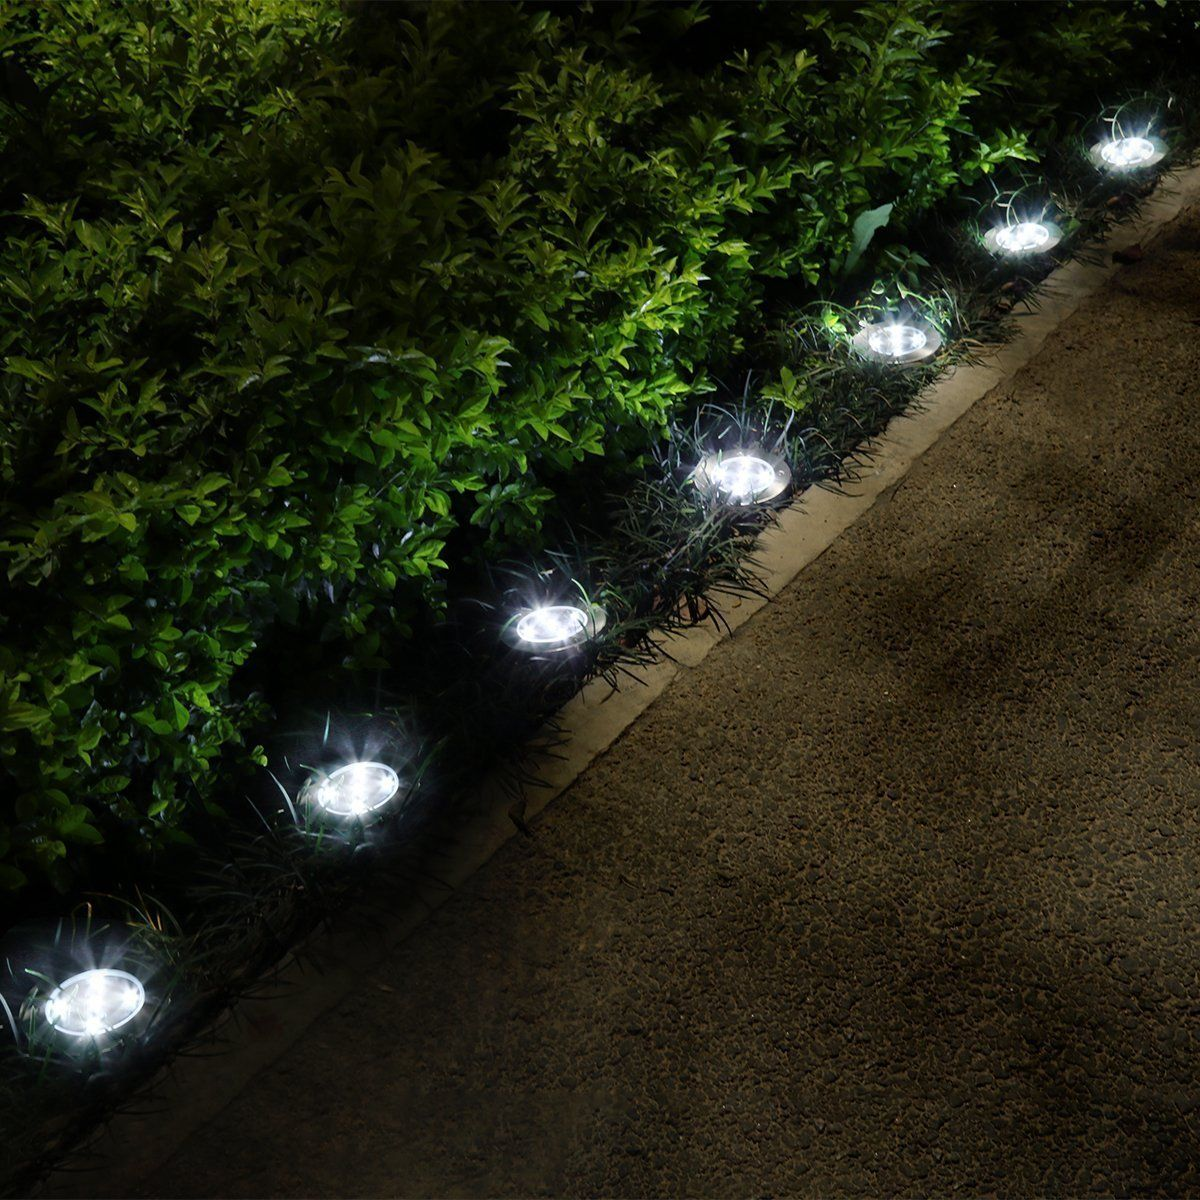 19 99 Solar Garden Light Yunlights 5 Led Solar Ground Lights Waterproof Patio Light With Dark Sensing Fo Solar Lights Garden Outdoor Solar Lights Lawn Lights